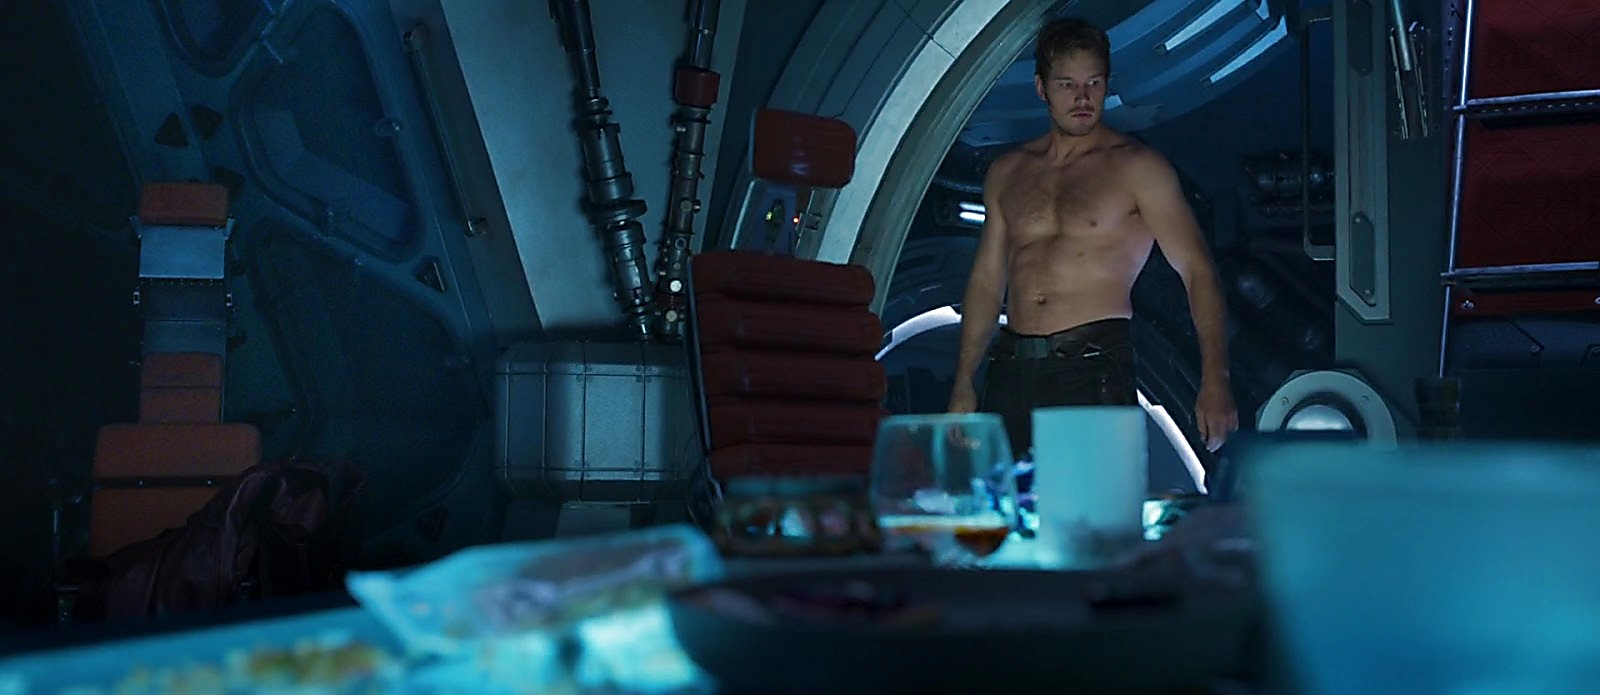 Chris Pratt latest sexy shirtless scene August 8, 2017, 12pm